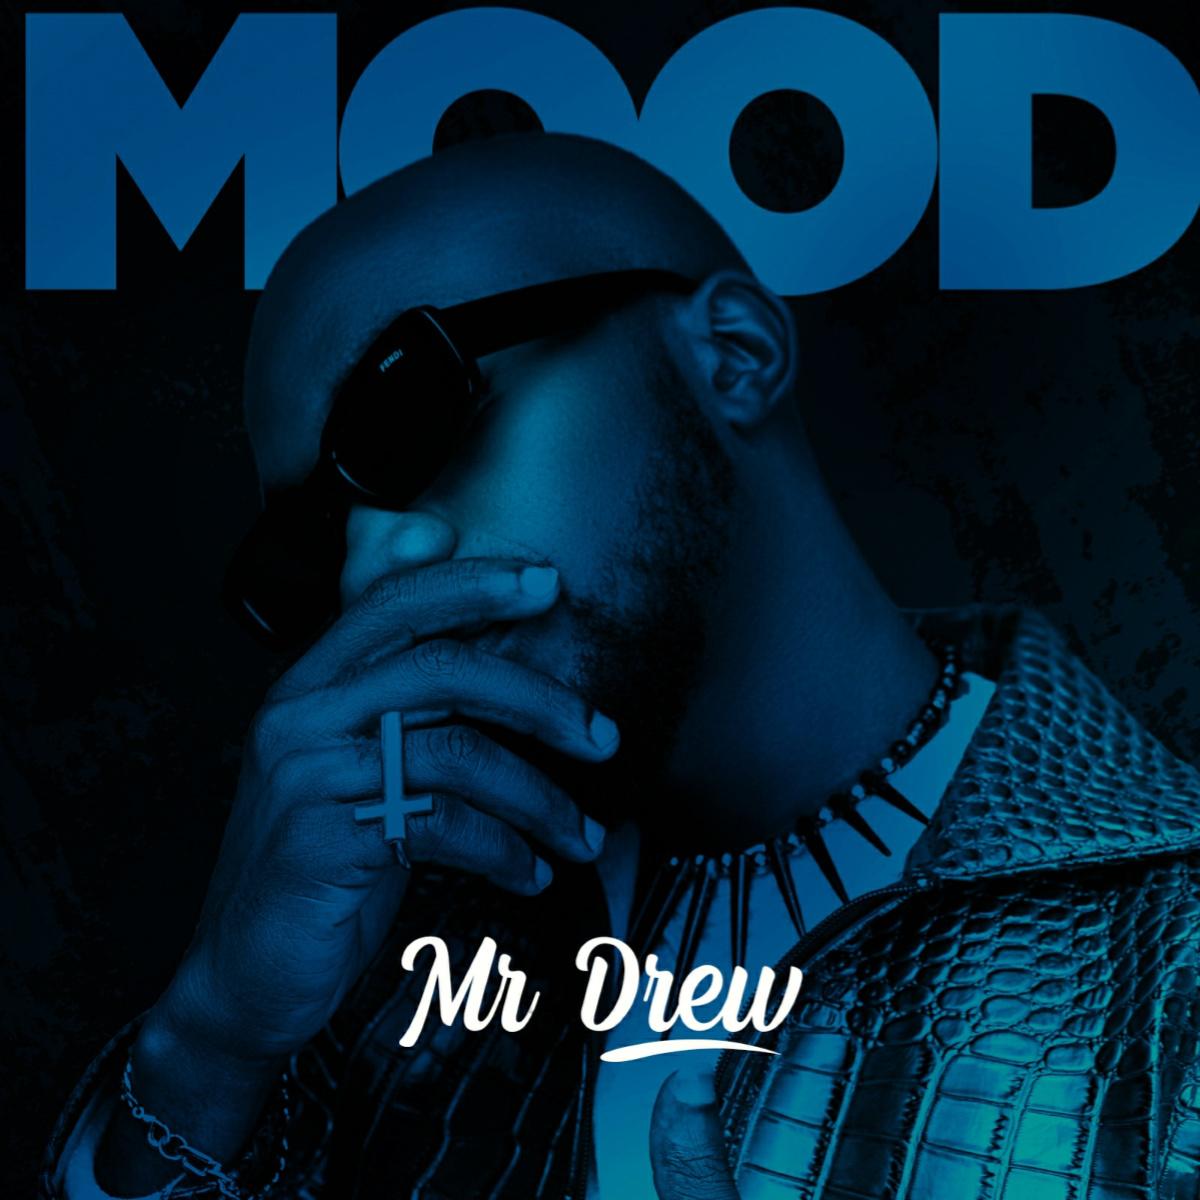 Mood by Mr Drew